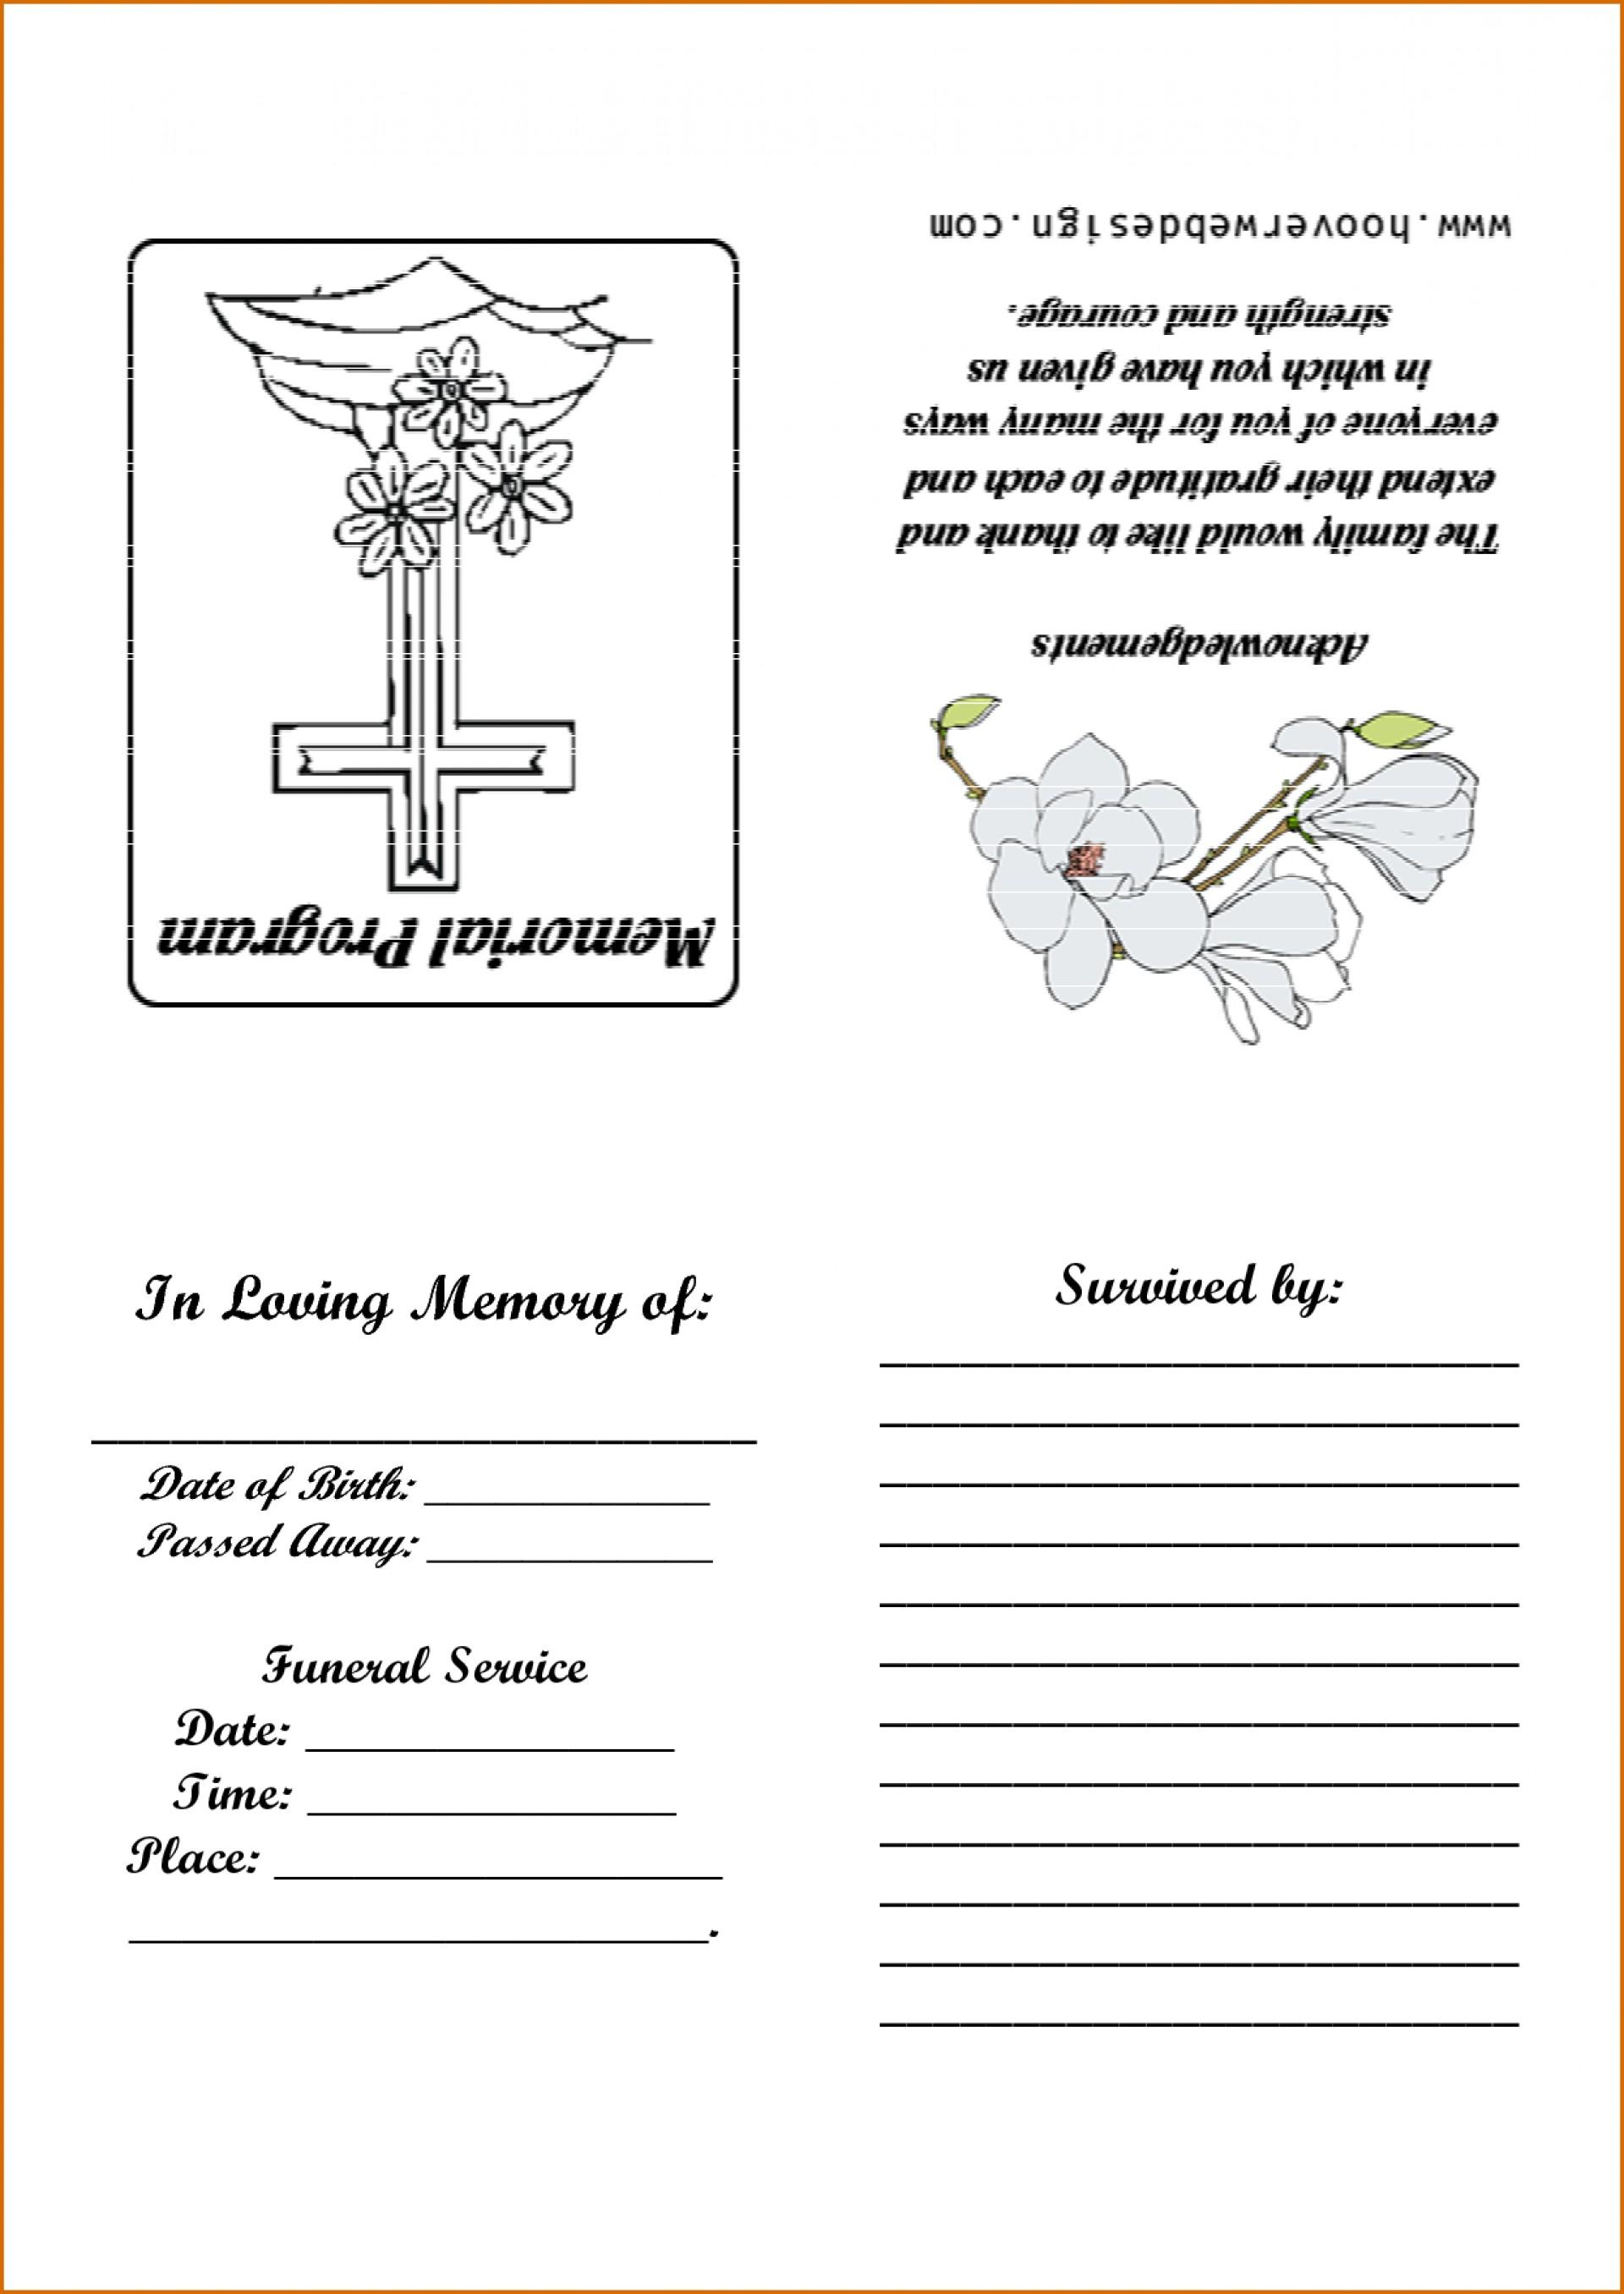 021 Free Printable Funeral Program Template Word Unforgettable Ideas - Free Printable Funeral Program Template